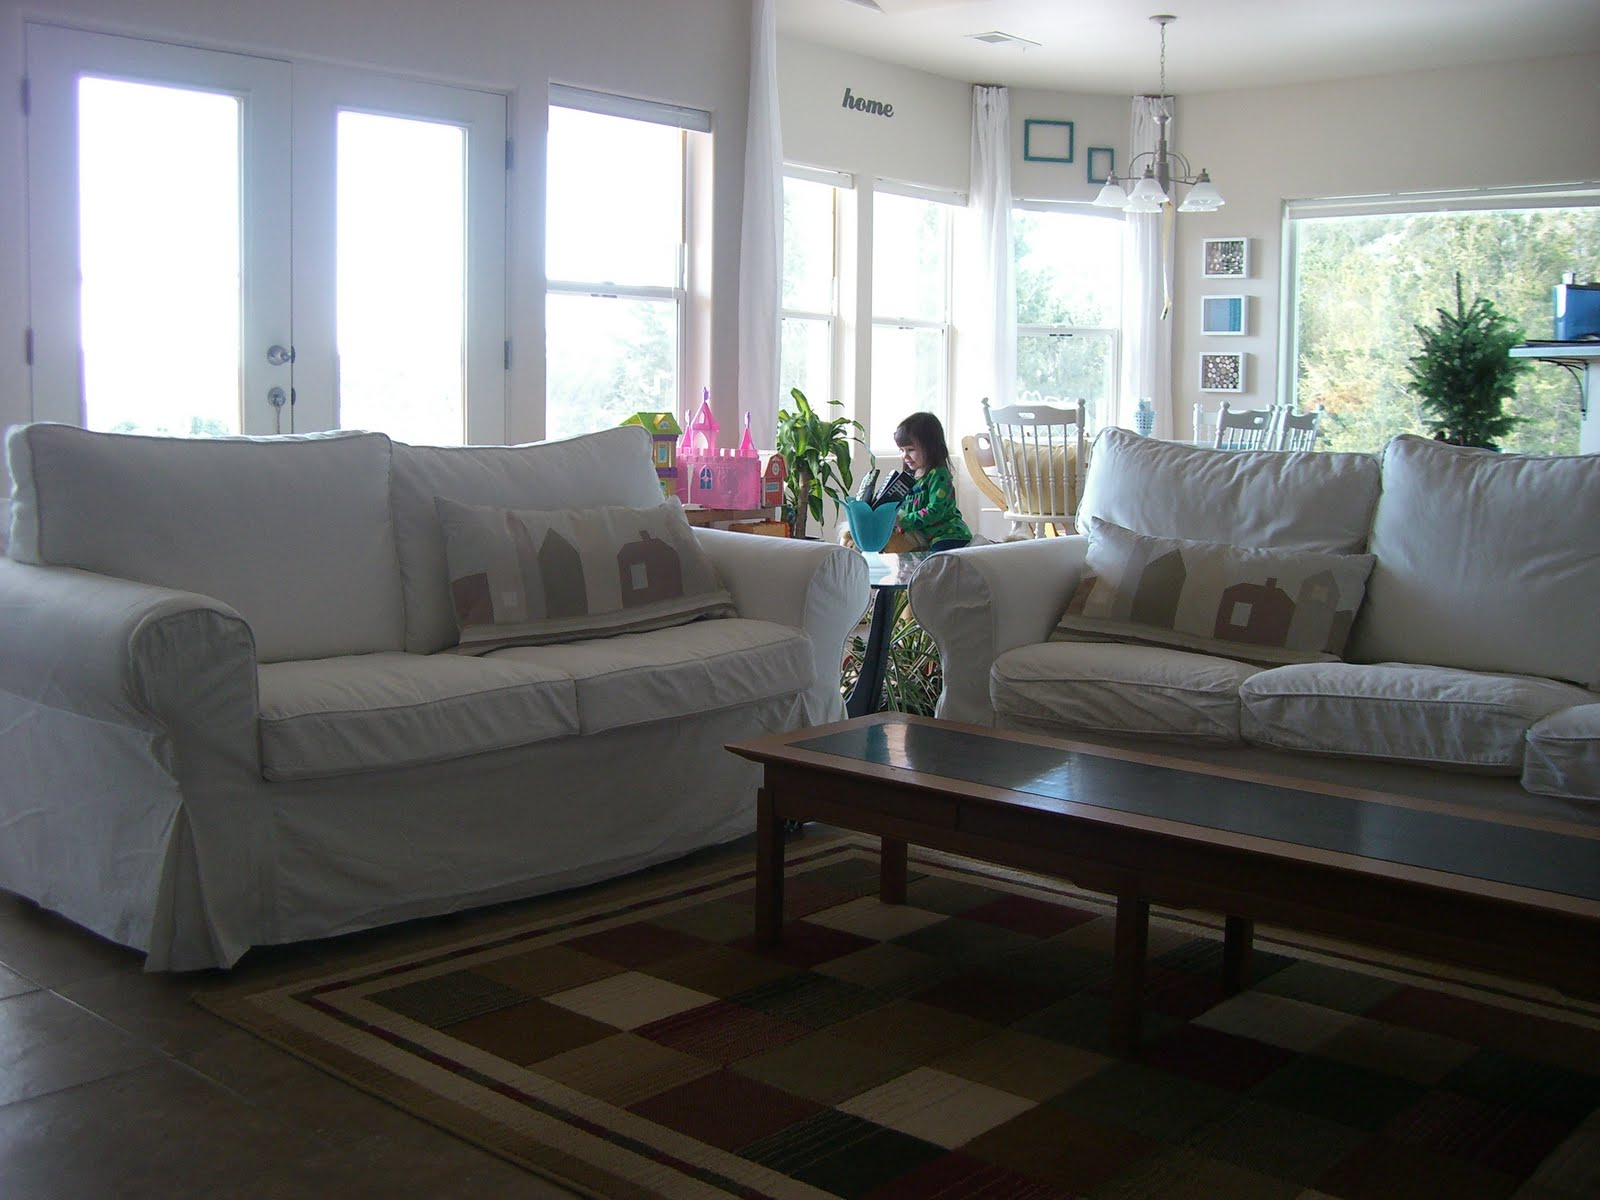 Home Kids Life White Sofas Amp Children Ikea Ektorp